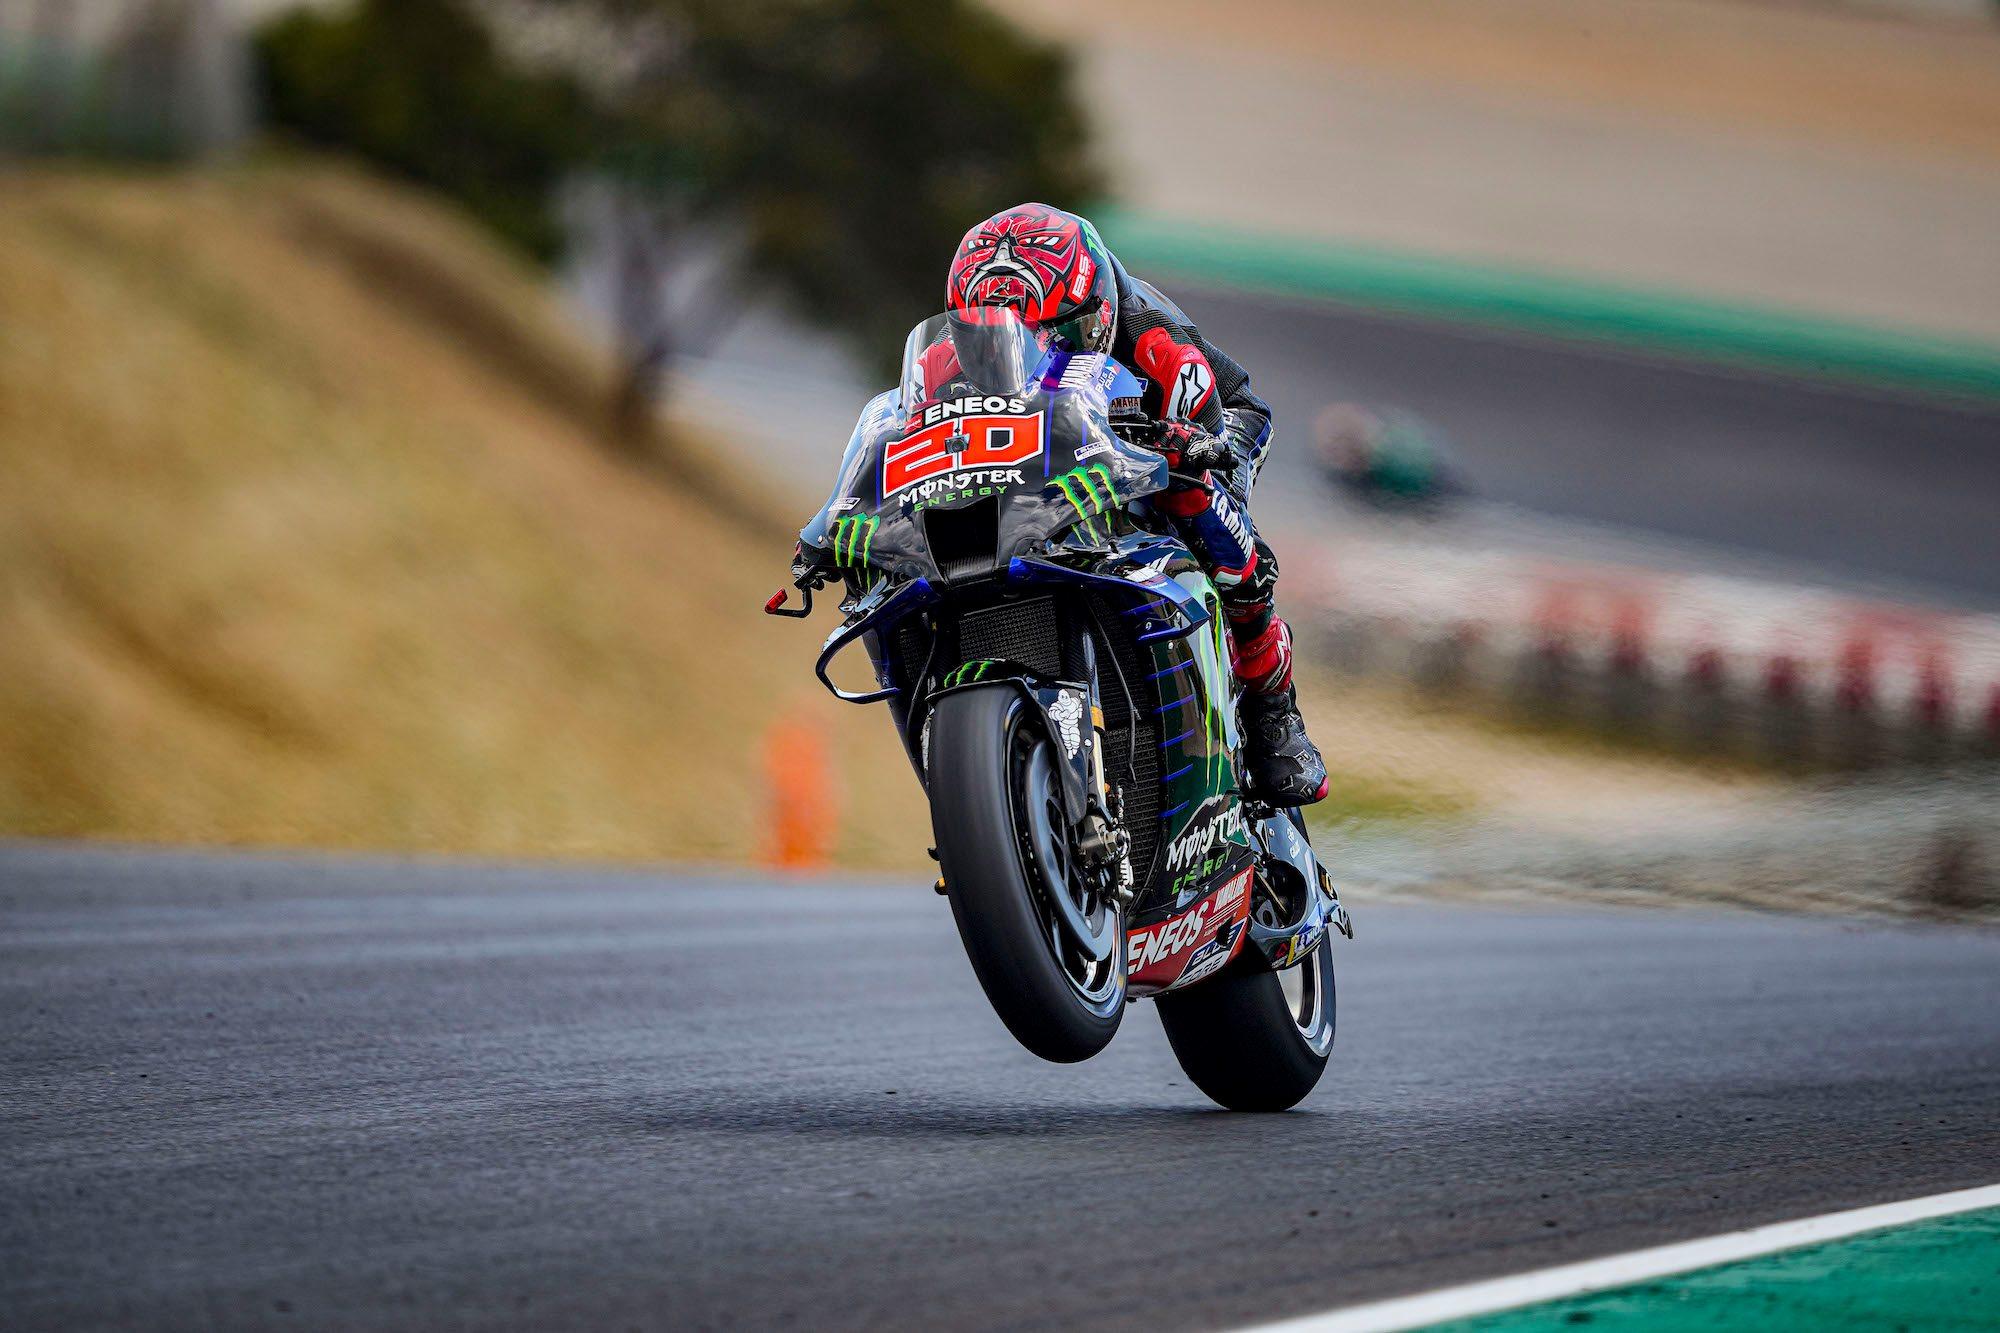 MotoGP. Portugalijoje antrąją pergalę iškovojo F. Quartararo